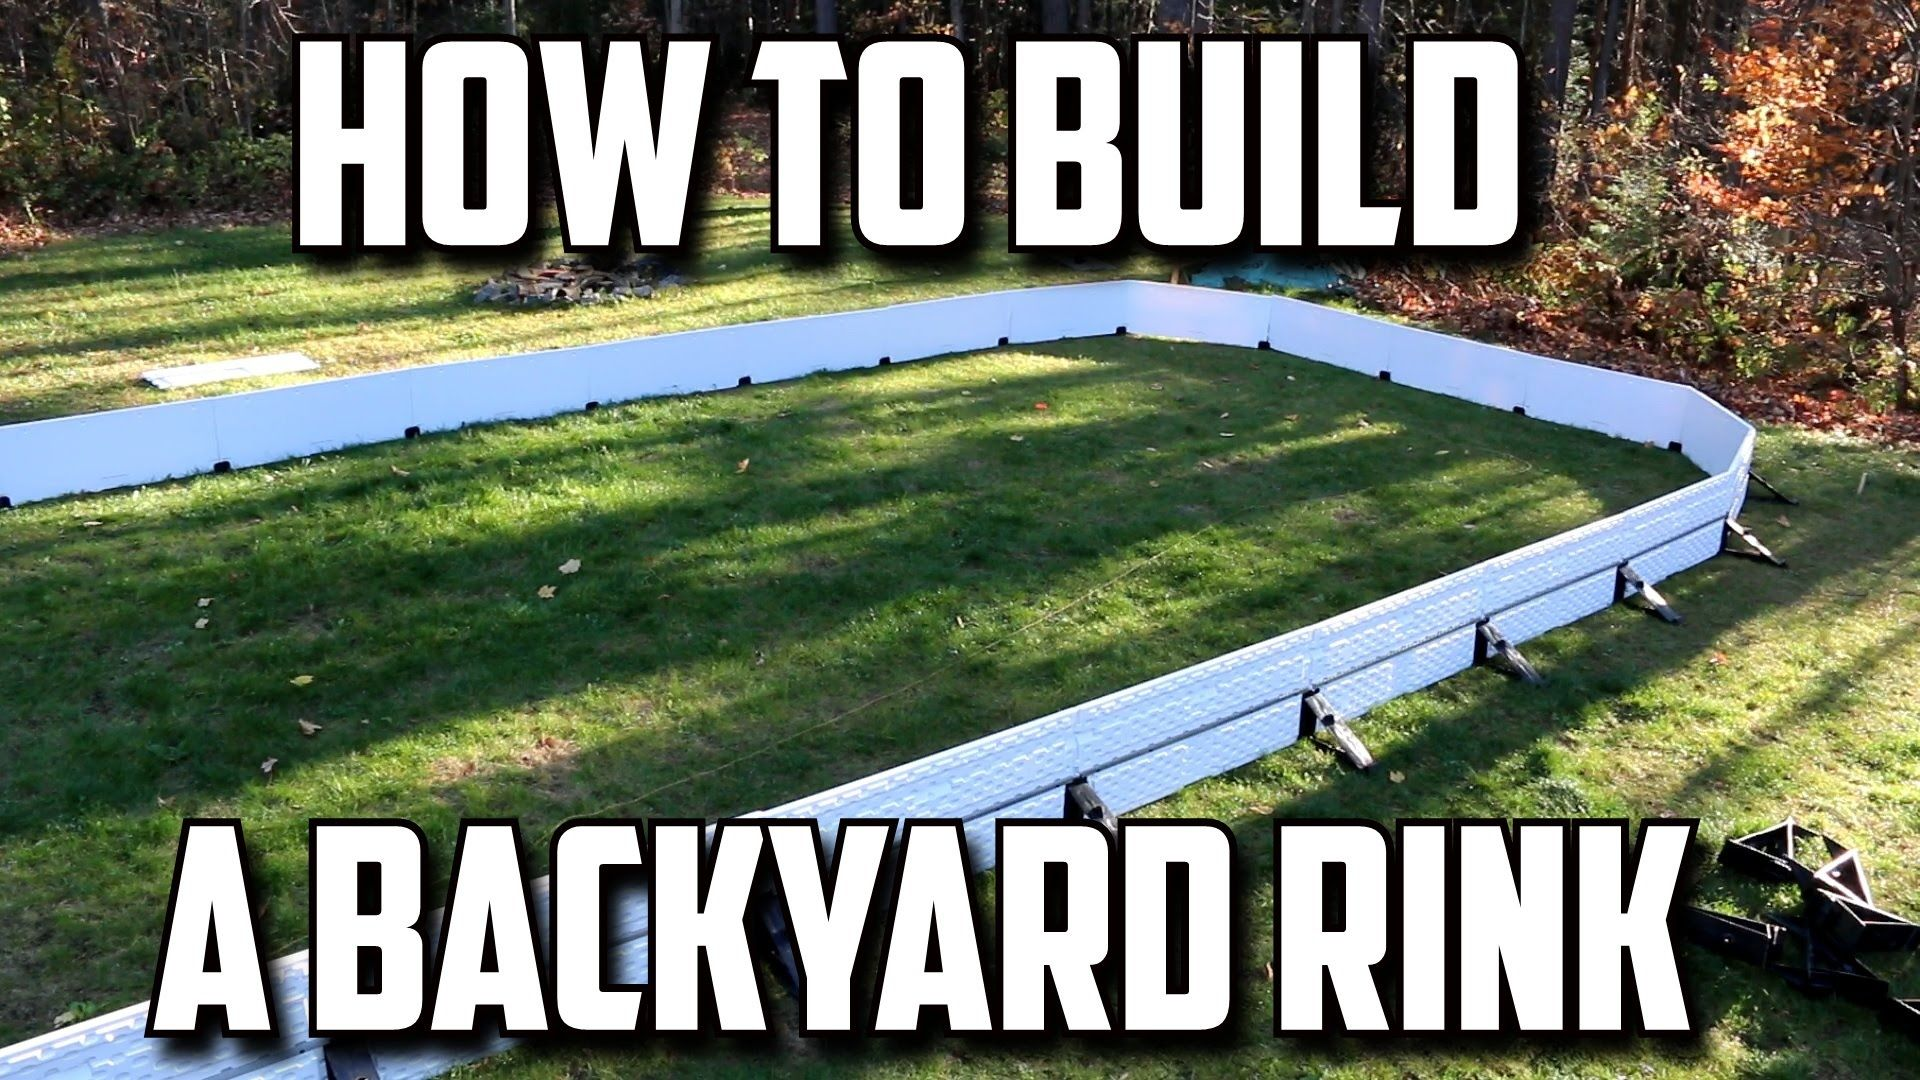 How To Build A Backyard Hockey Rink Backyard Rink Backyard Hockey Rink Backyard Ice Rink Backyard diy hockey rinks